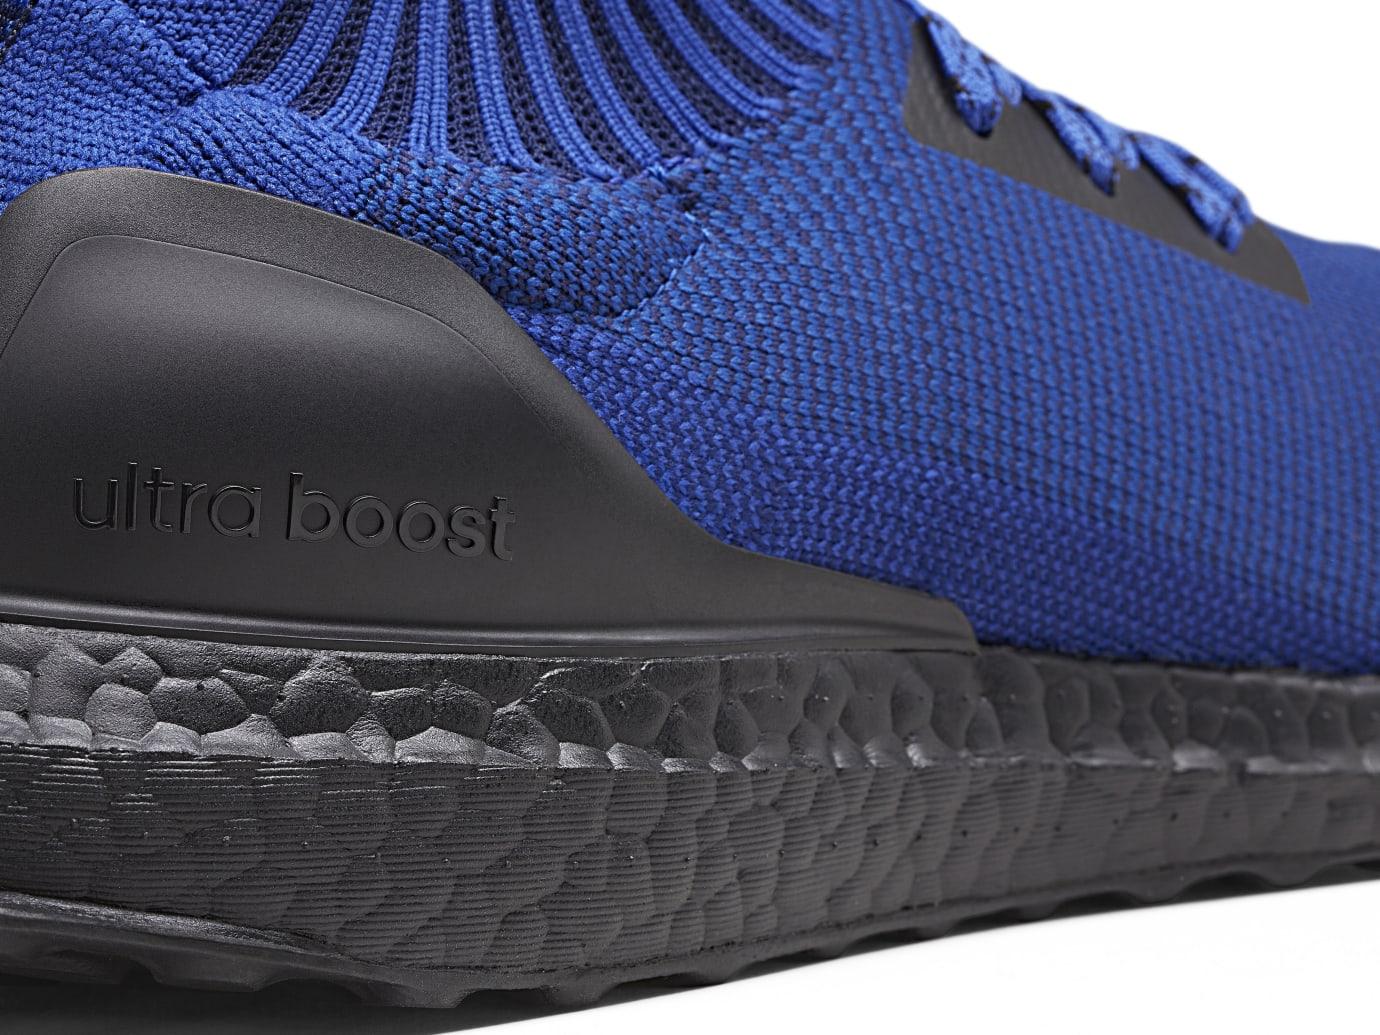 half off 6c4cd 2242f Études x Adidas Consortium Ultra Boost Uncaged D97732 ...